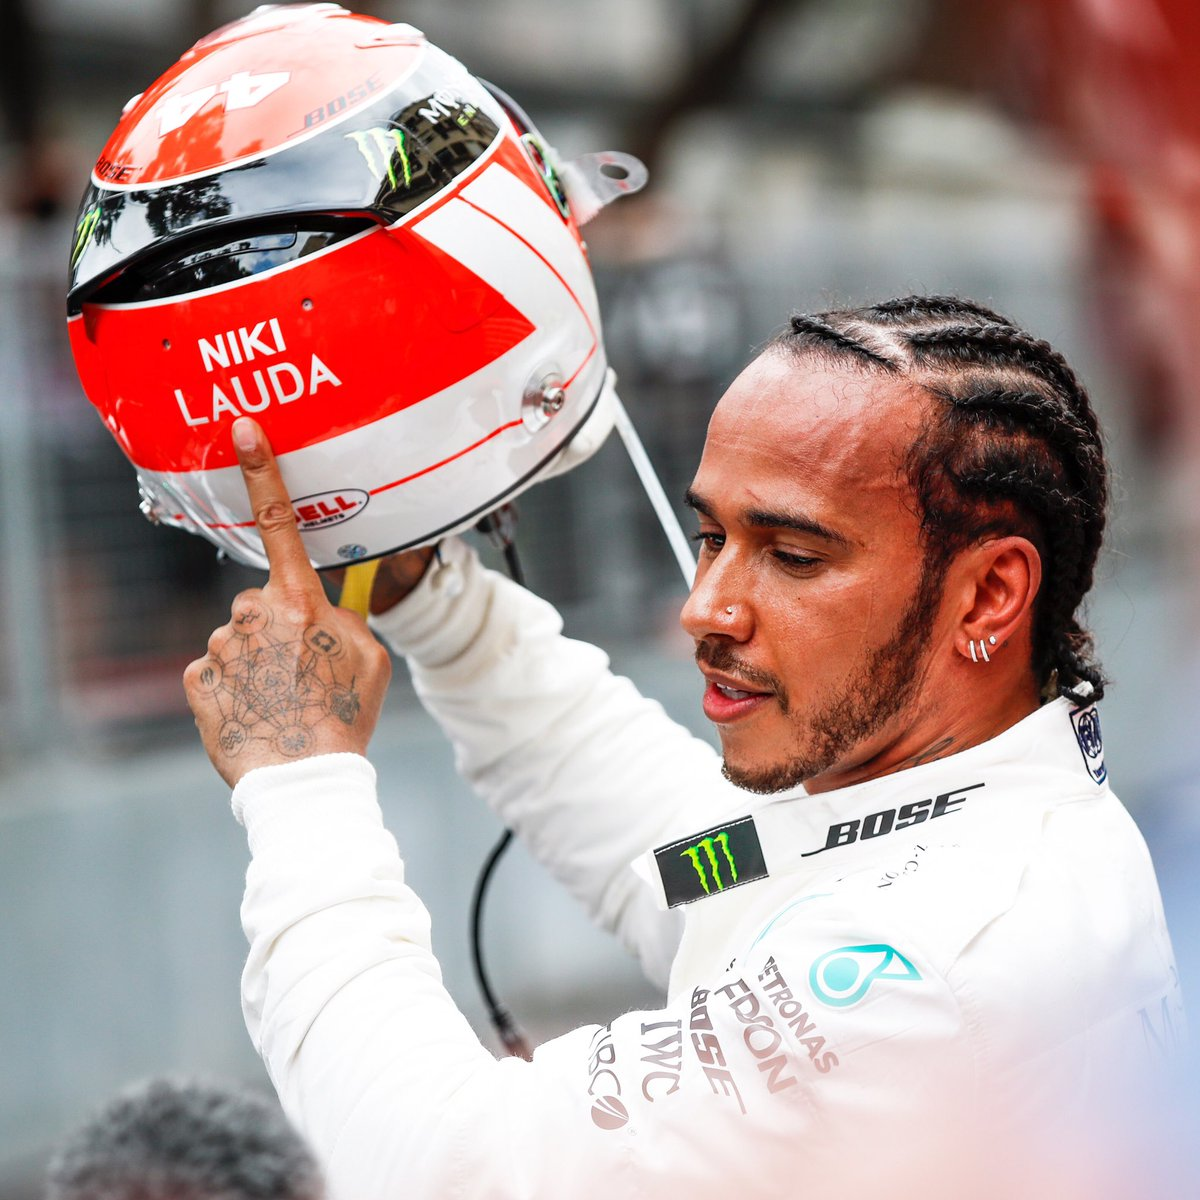 Today belongs to Niki... #MonacoGP